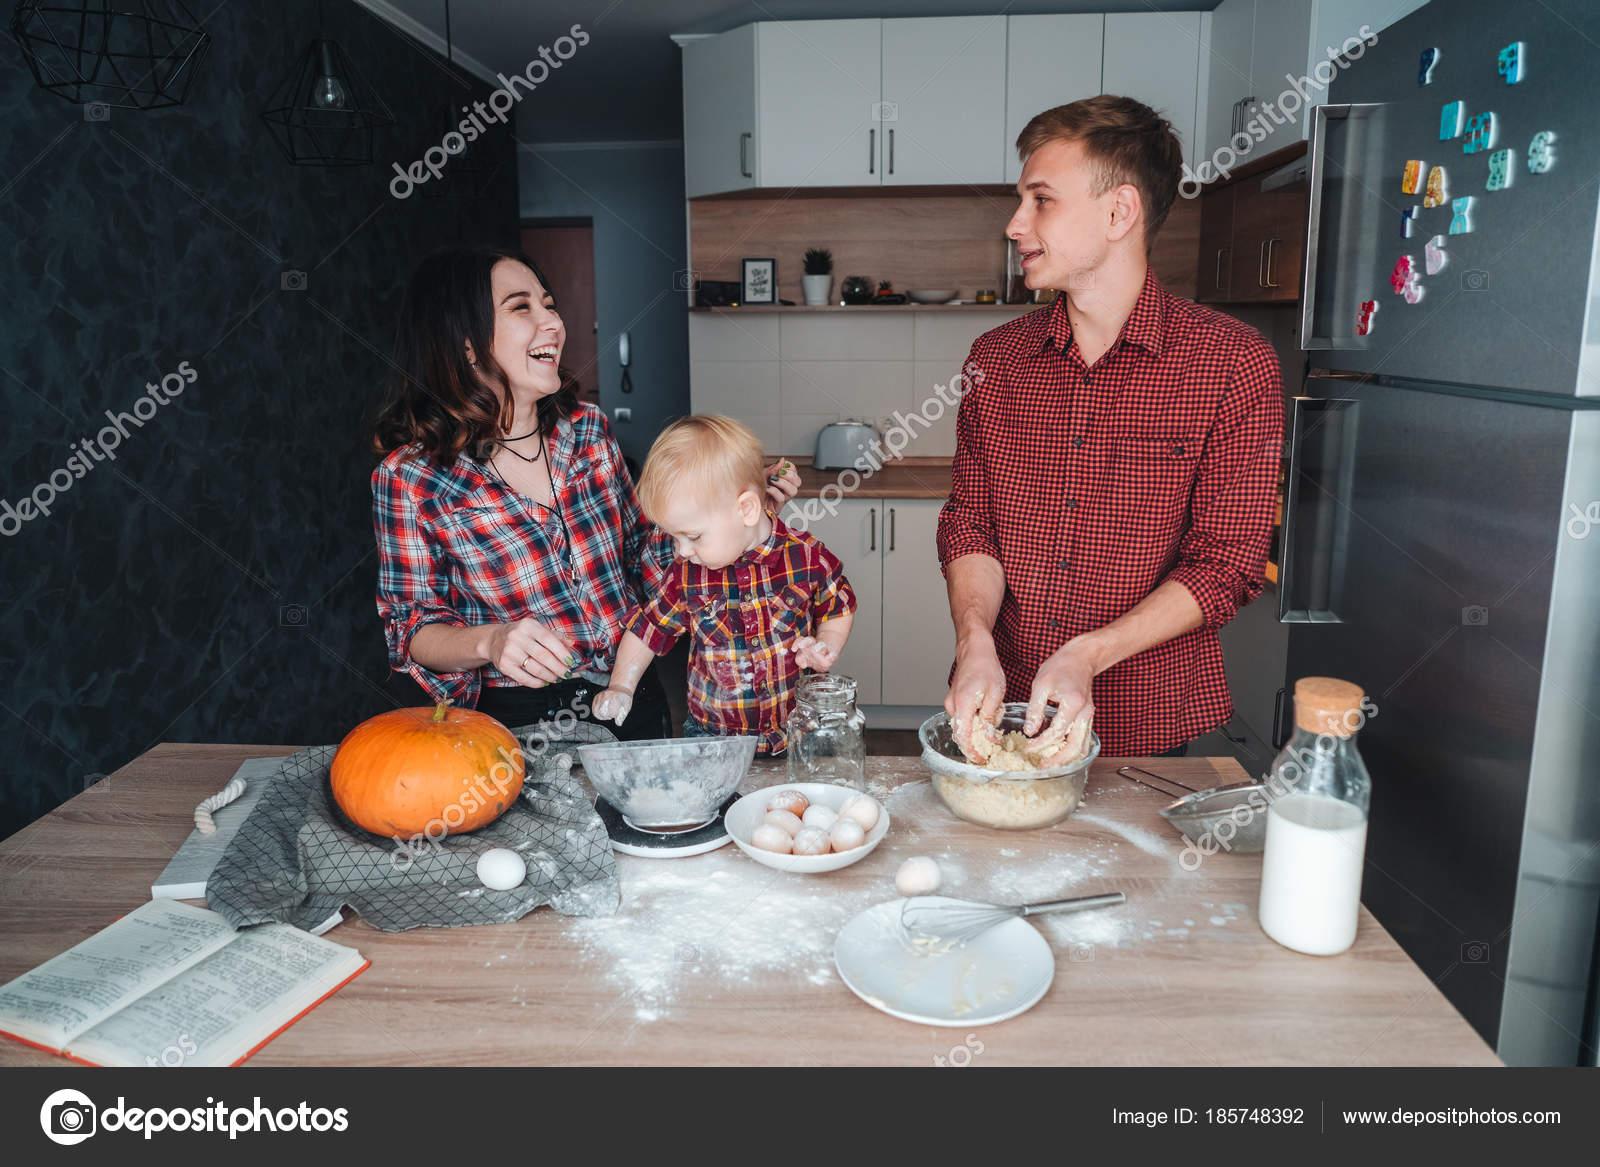 Сын трахнув маму в попу на кухни, Сын ебет маму в жопу на кухне - порно видео онлайн 14 фотография